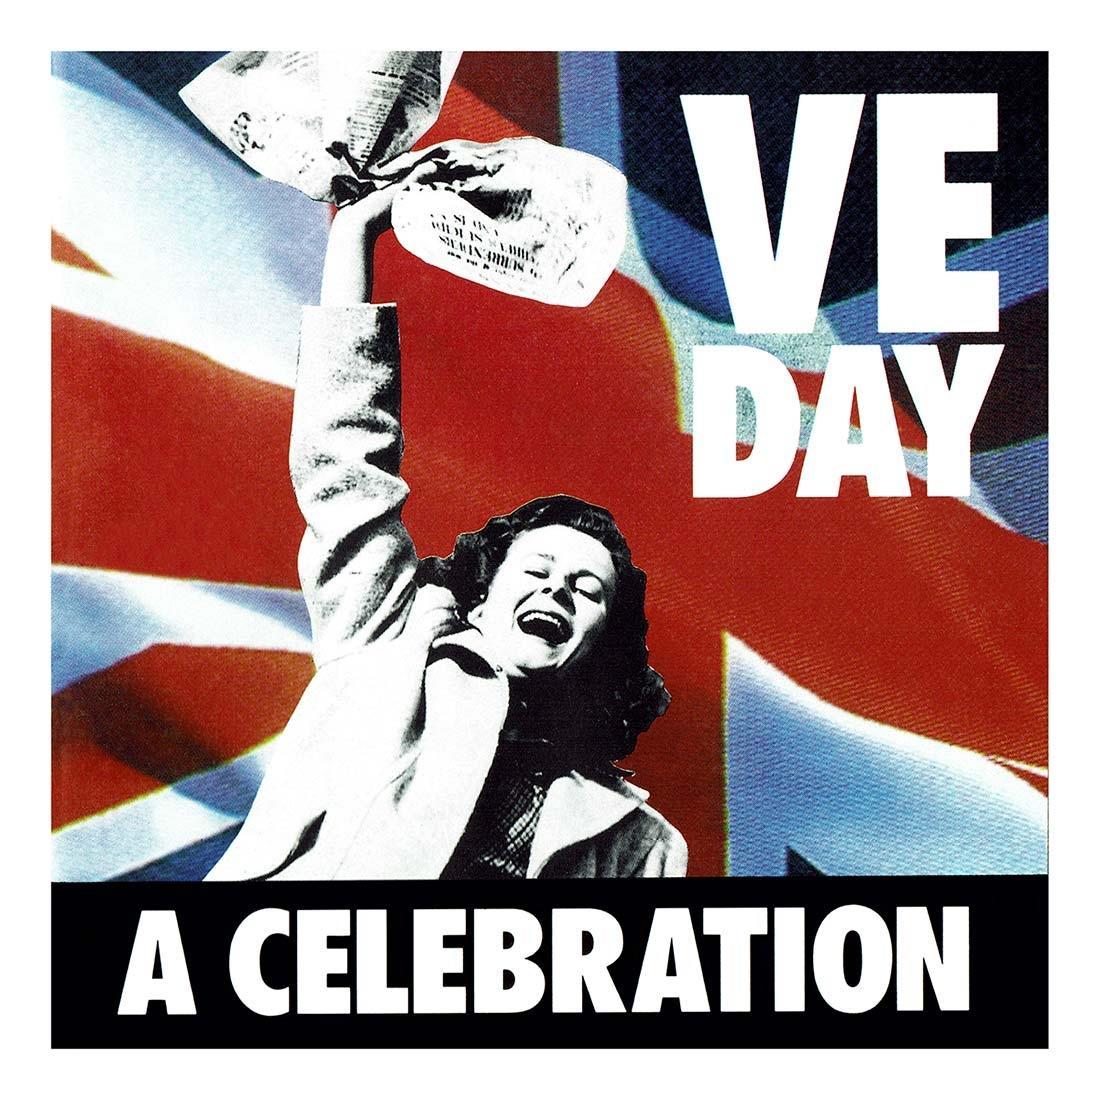 CD - VE Day, A Celebration - The Airborne Shop